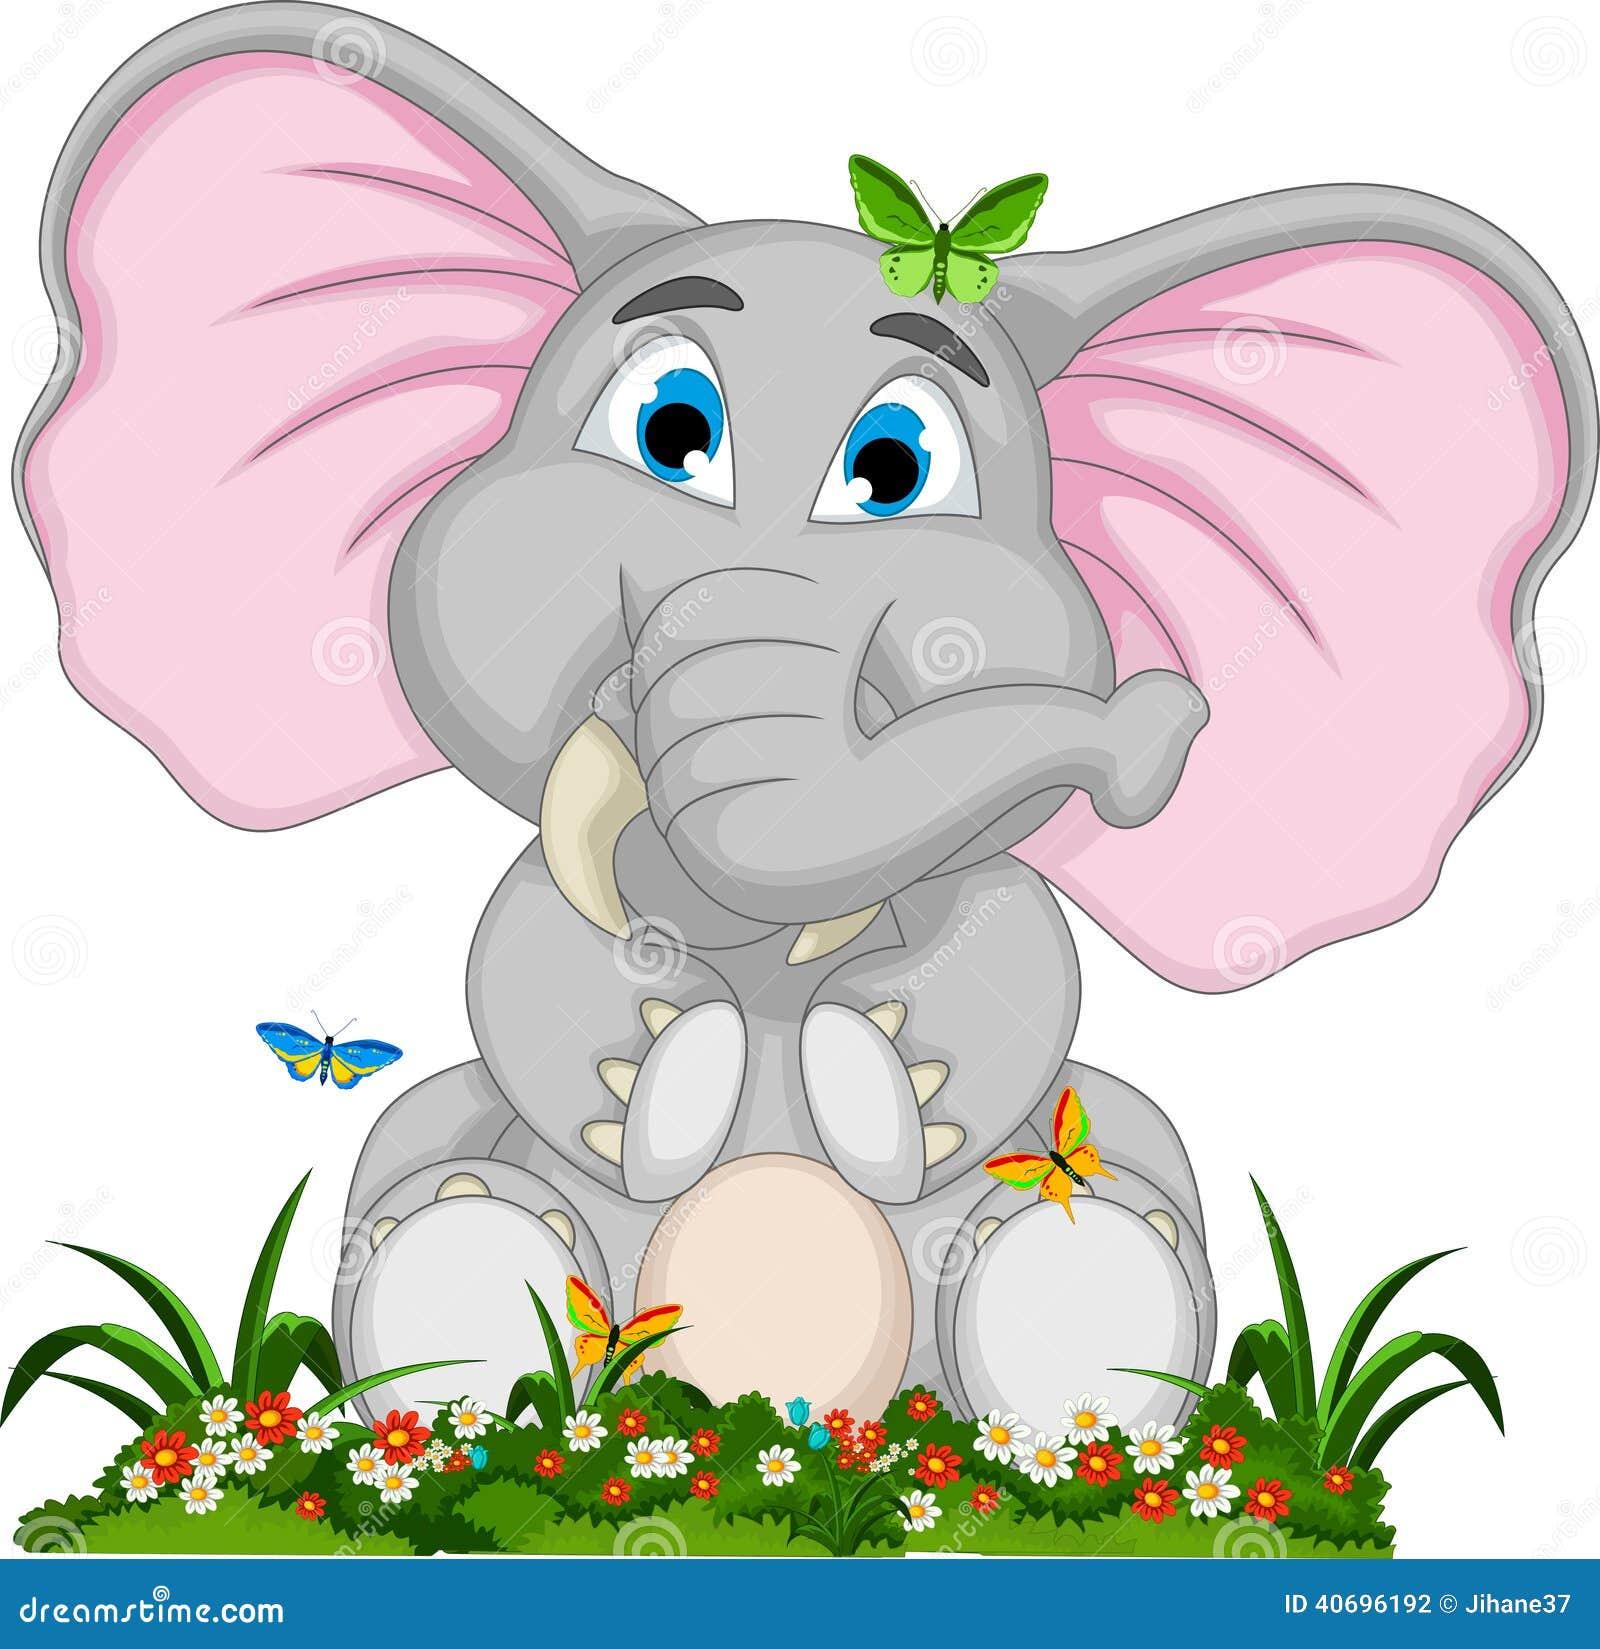 Garden Cute Cartoon: Cute Elephant Cartoon Sitting In Garden Stock Illustration